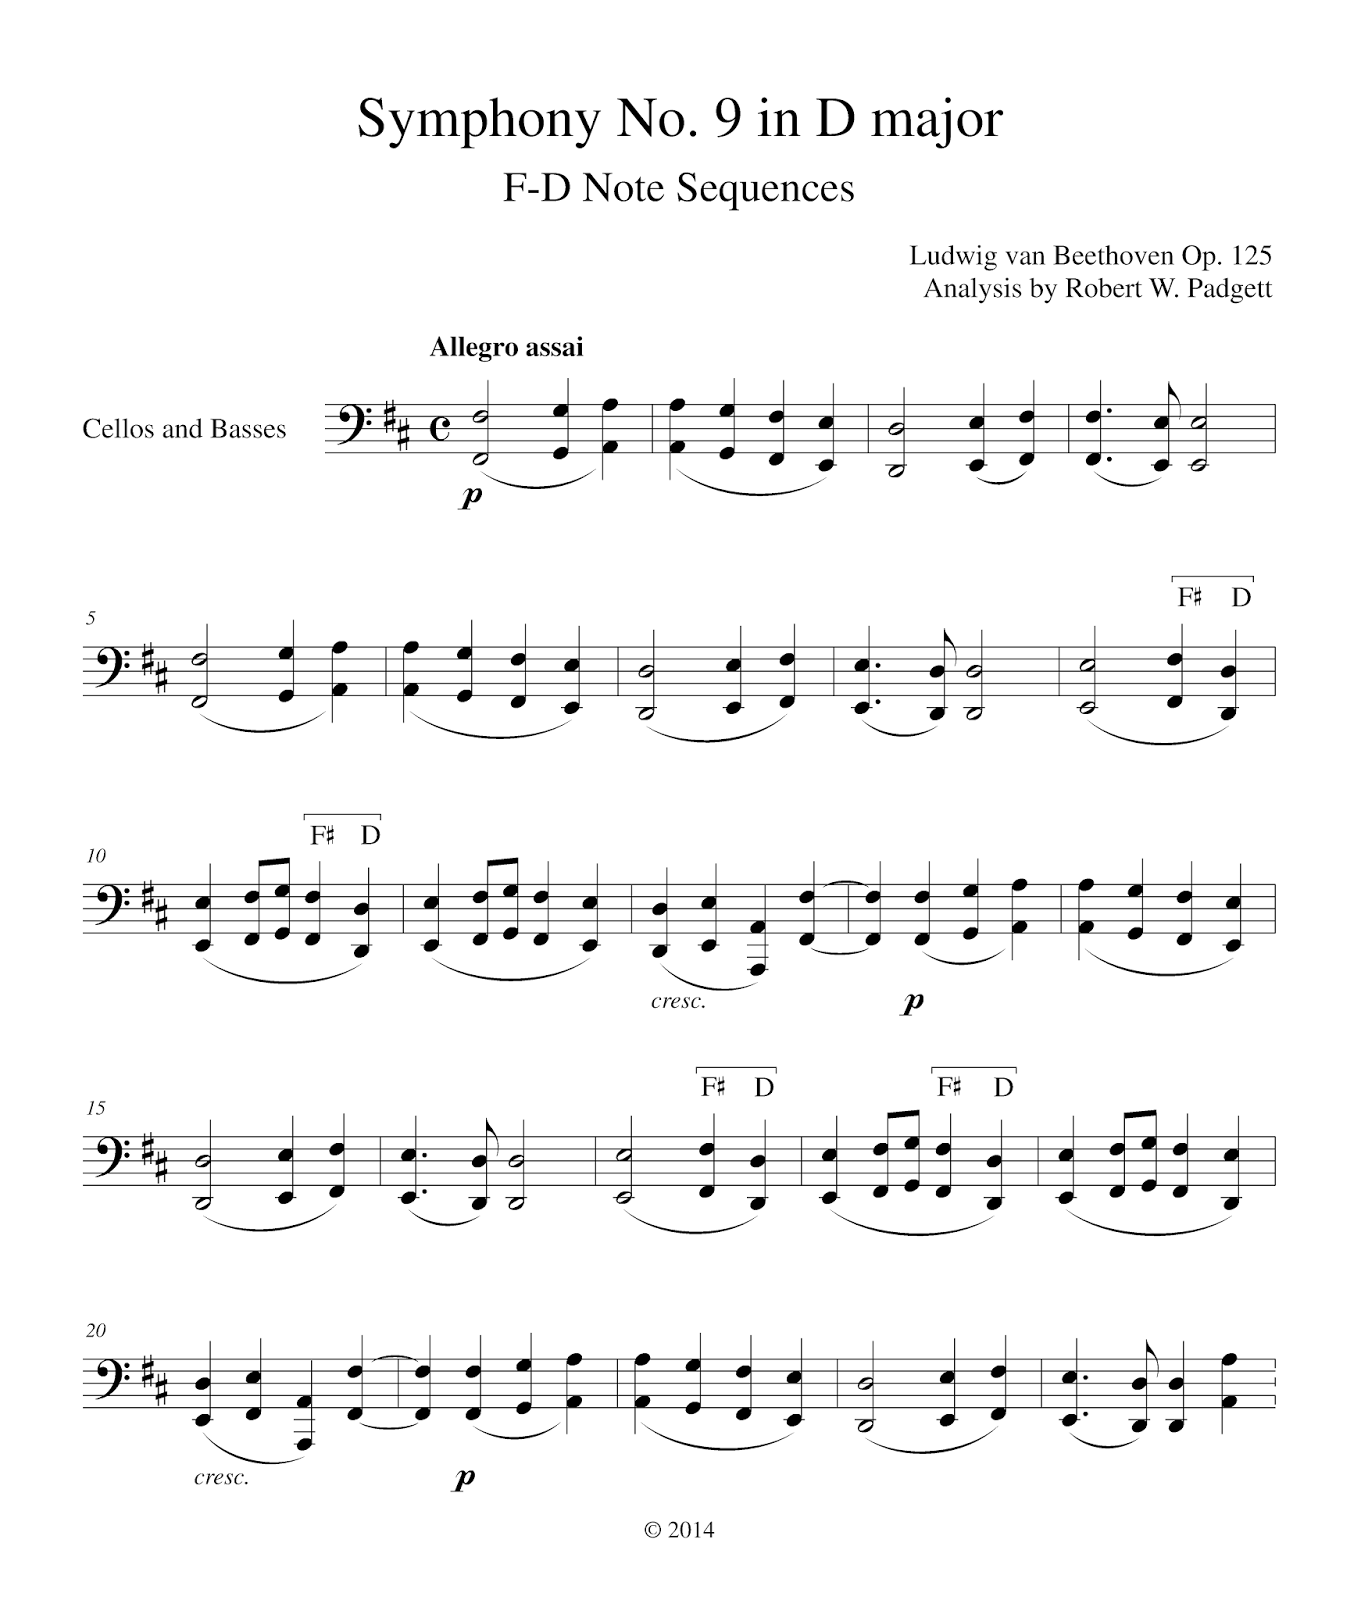 Elgar's Enigma Theme Unmasked: Beethoven's Ninth DEAF Cipher